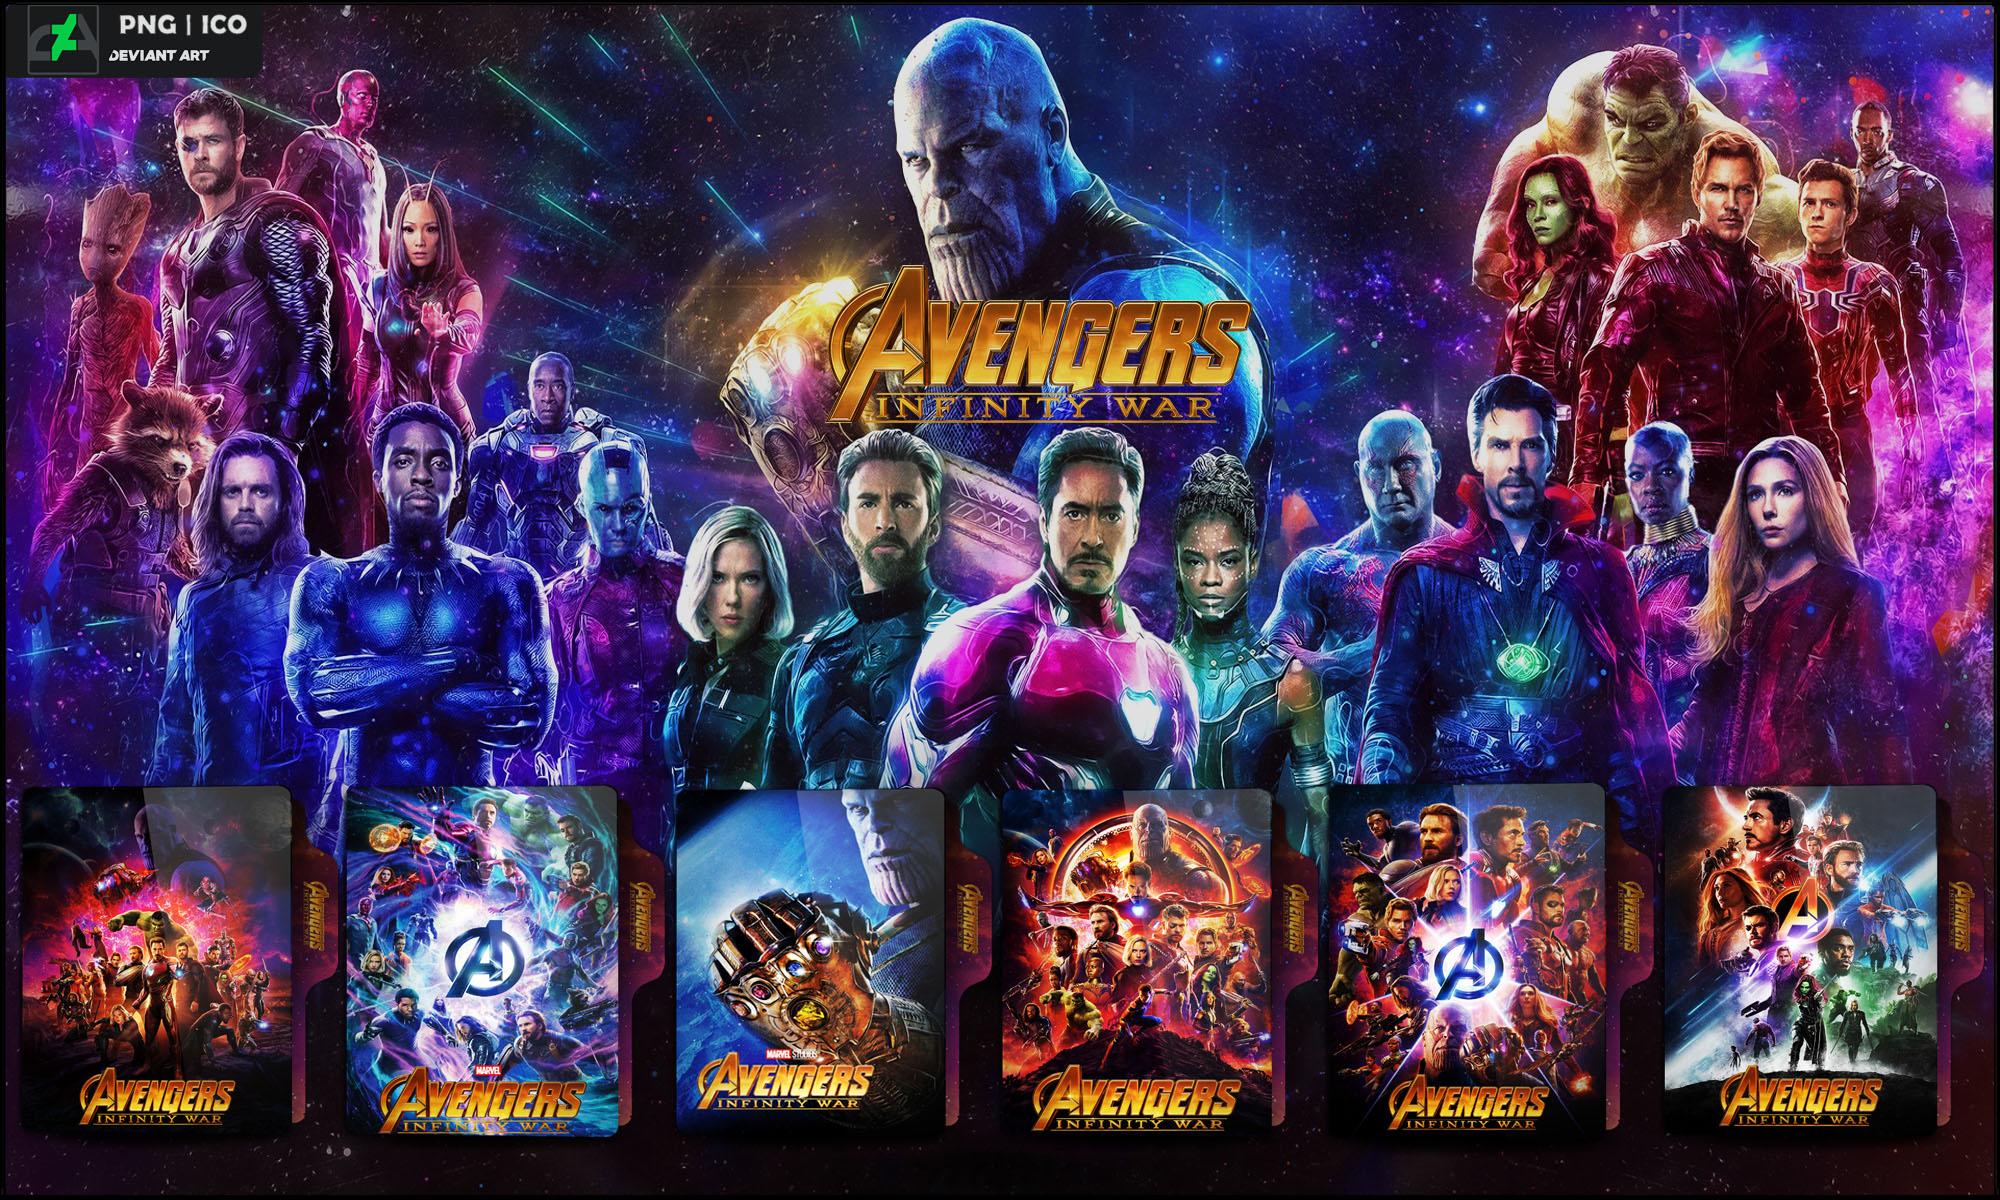 Avengers Infinity War 2018 Folder Icon Pack By Omidh3ro On Deviantart